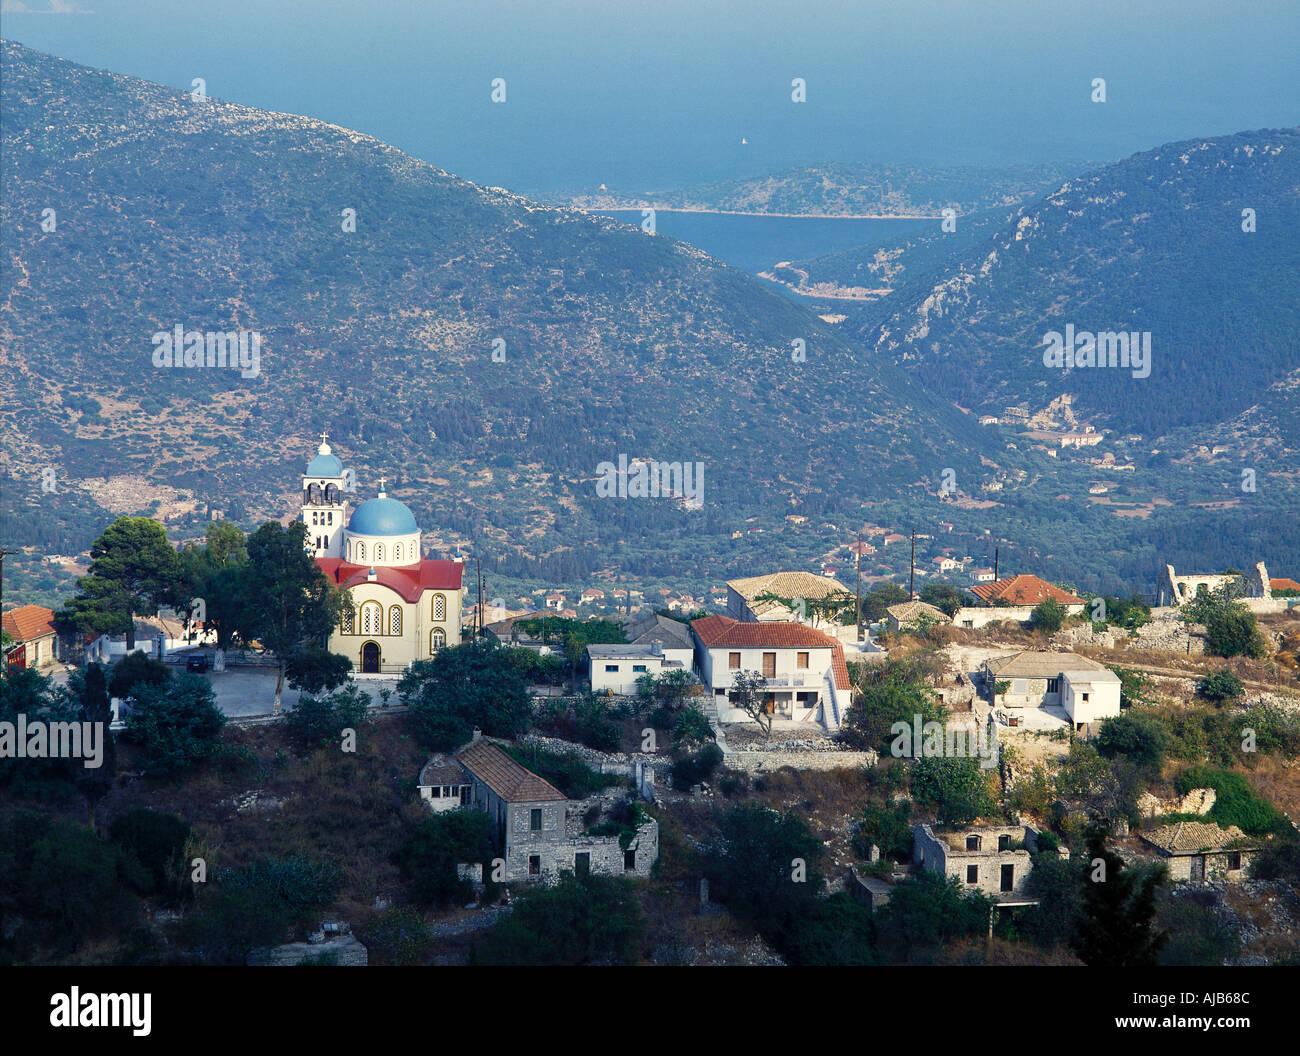 EXOGHI ITHAKI ITHAKA GREECE Europe Greece Ionian including Corfu - Stock Image